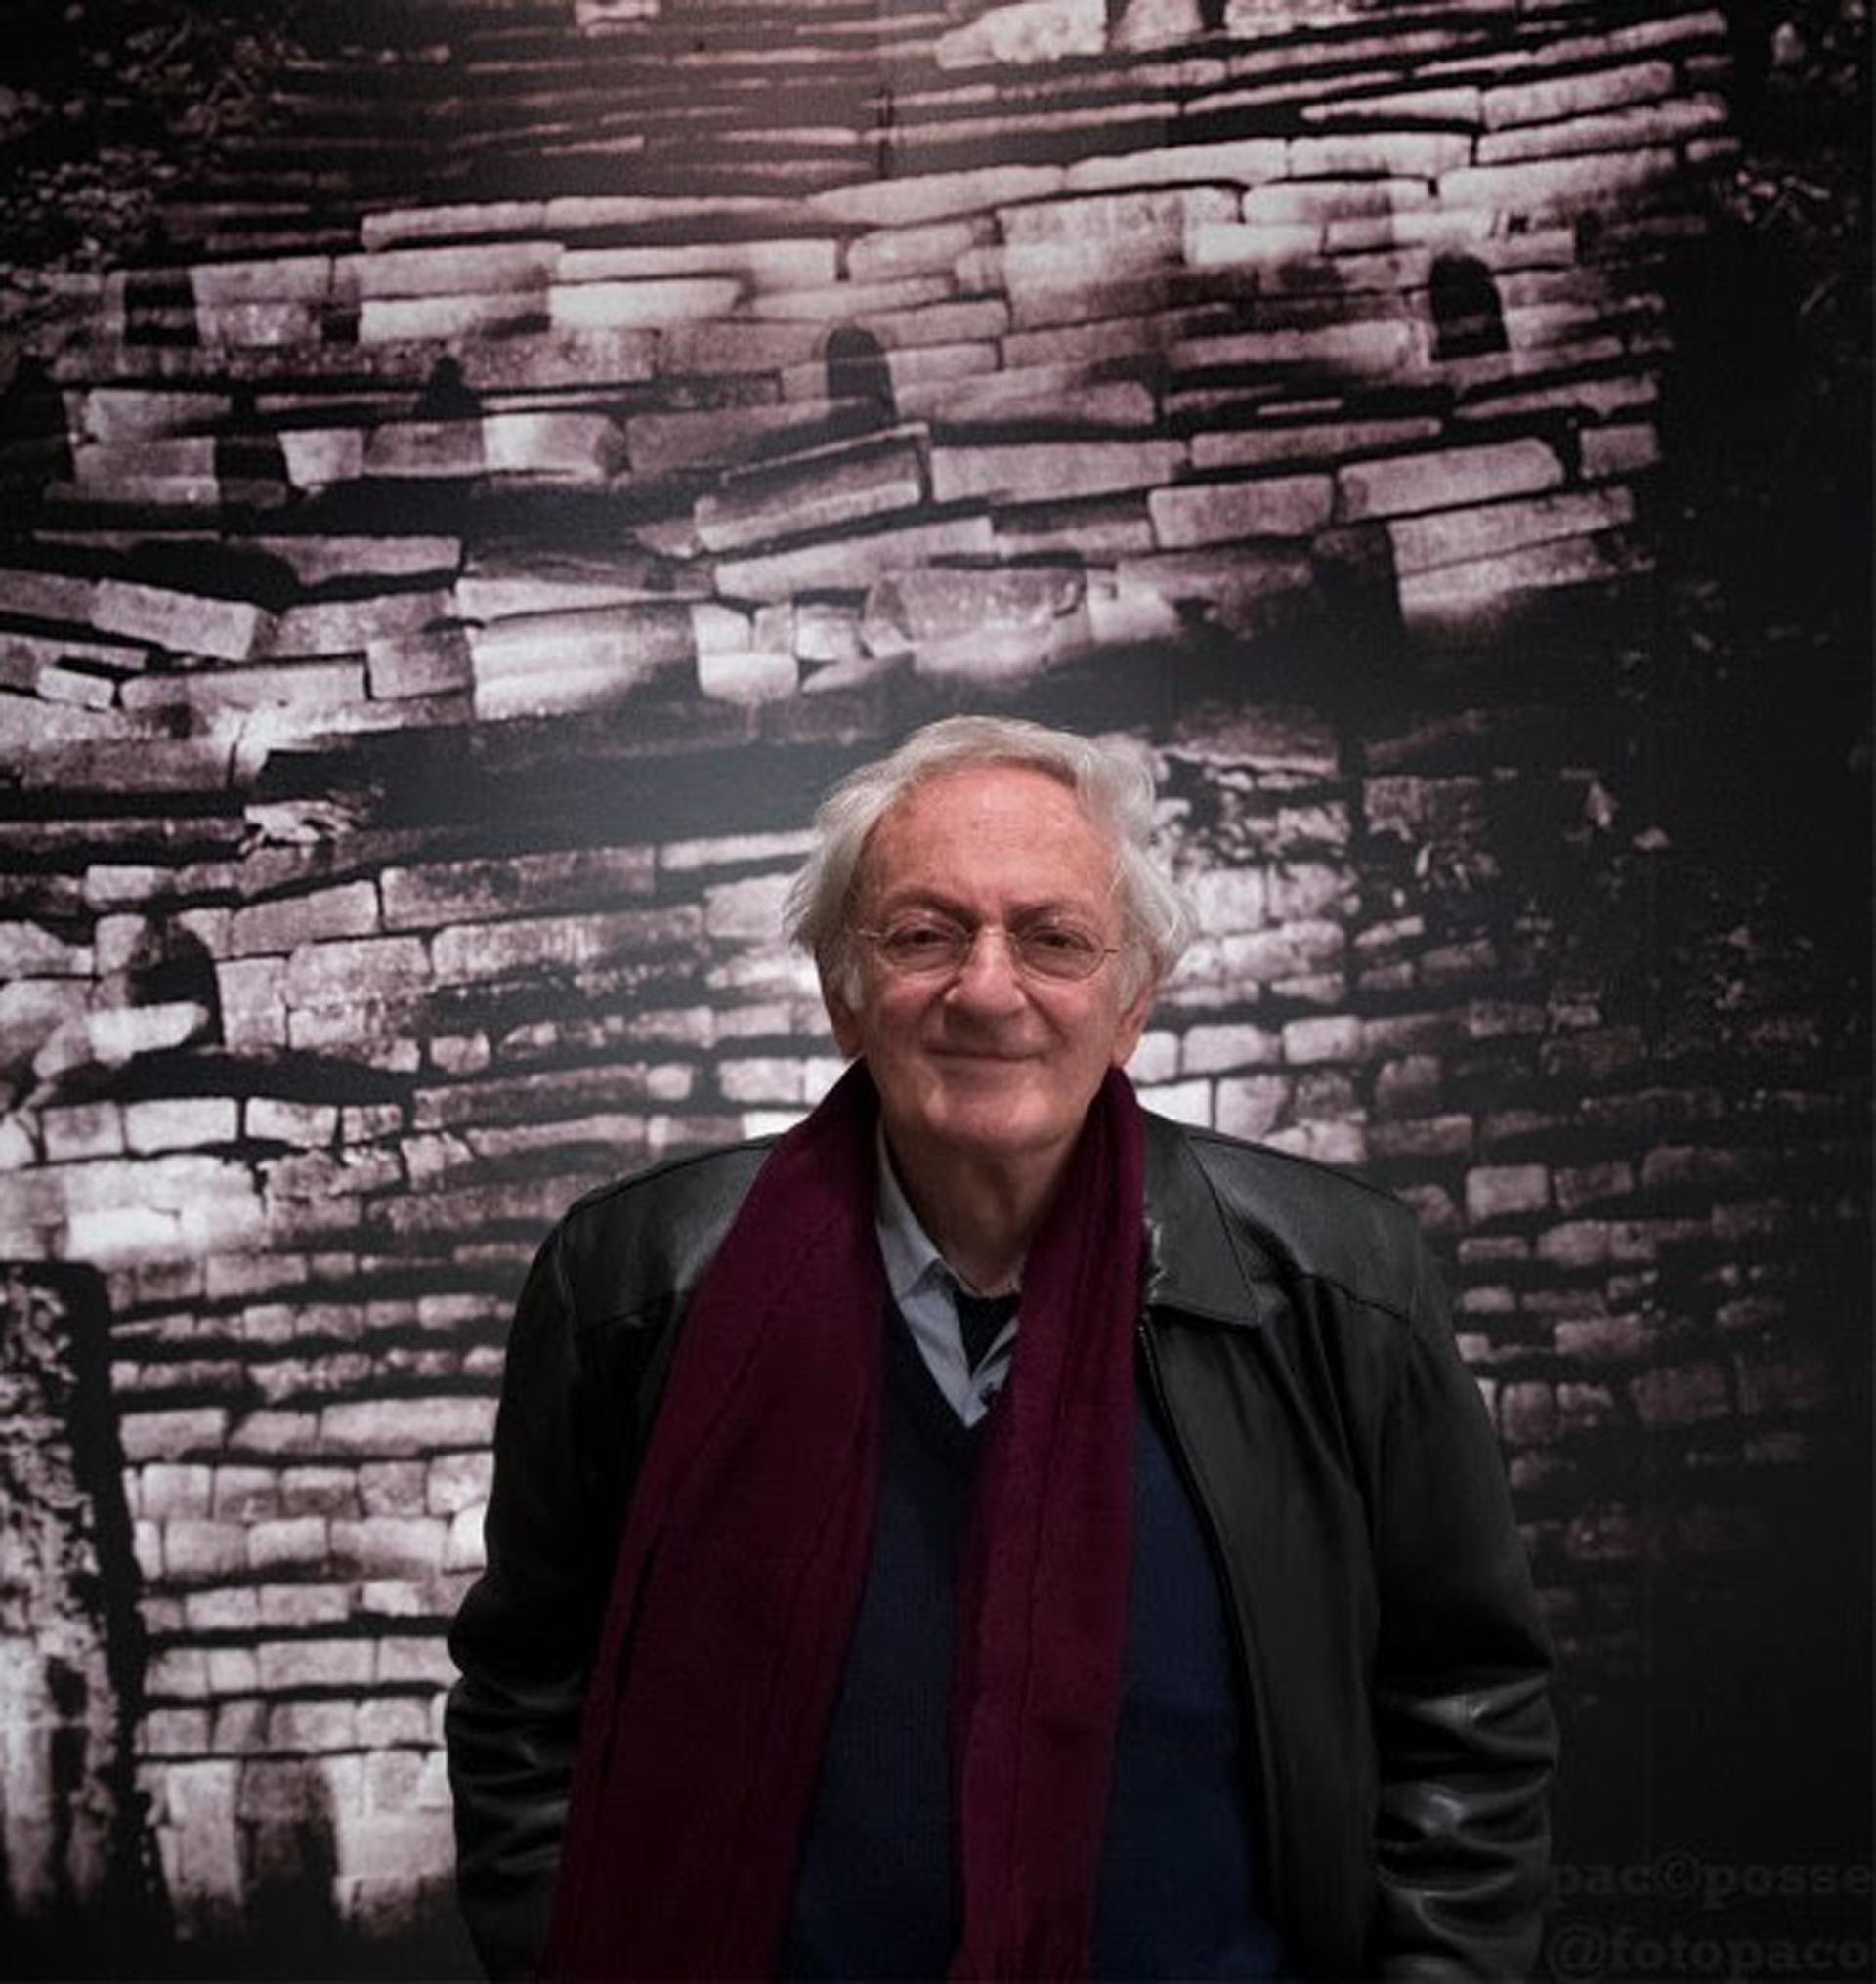 Leandro Katz, febrero 2017, Madrid